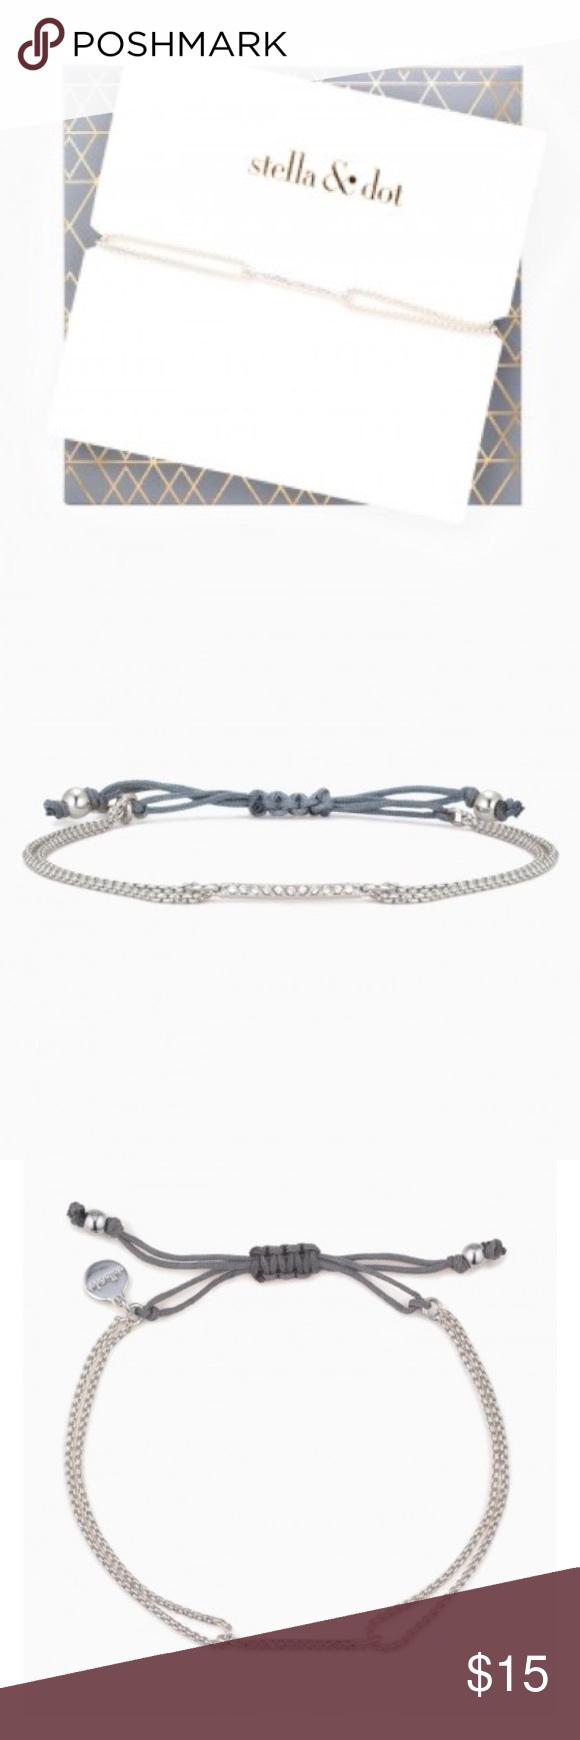 Stella Dot Pave Wishing Bracelet New In Package Stella Dot